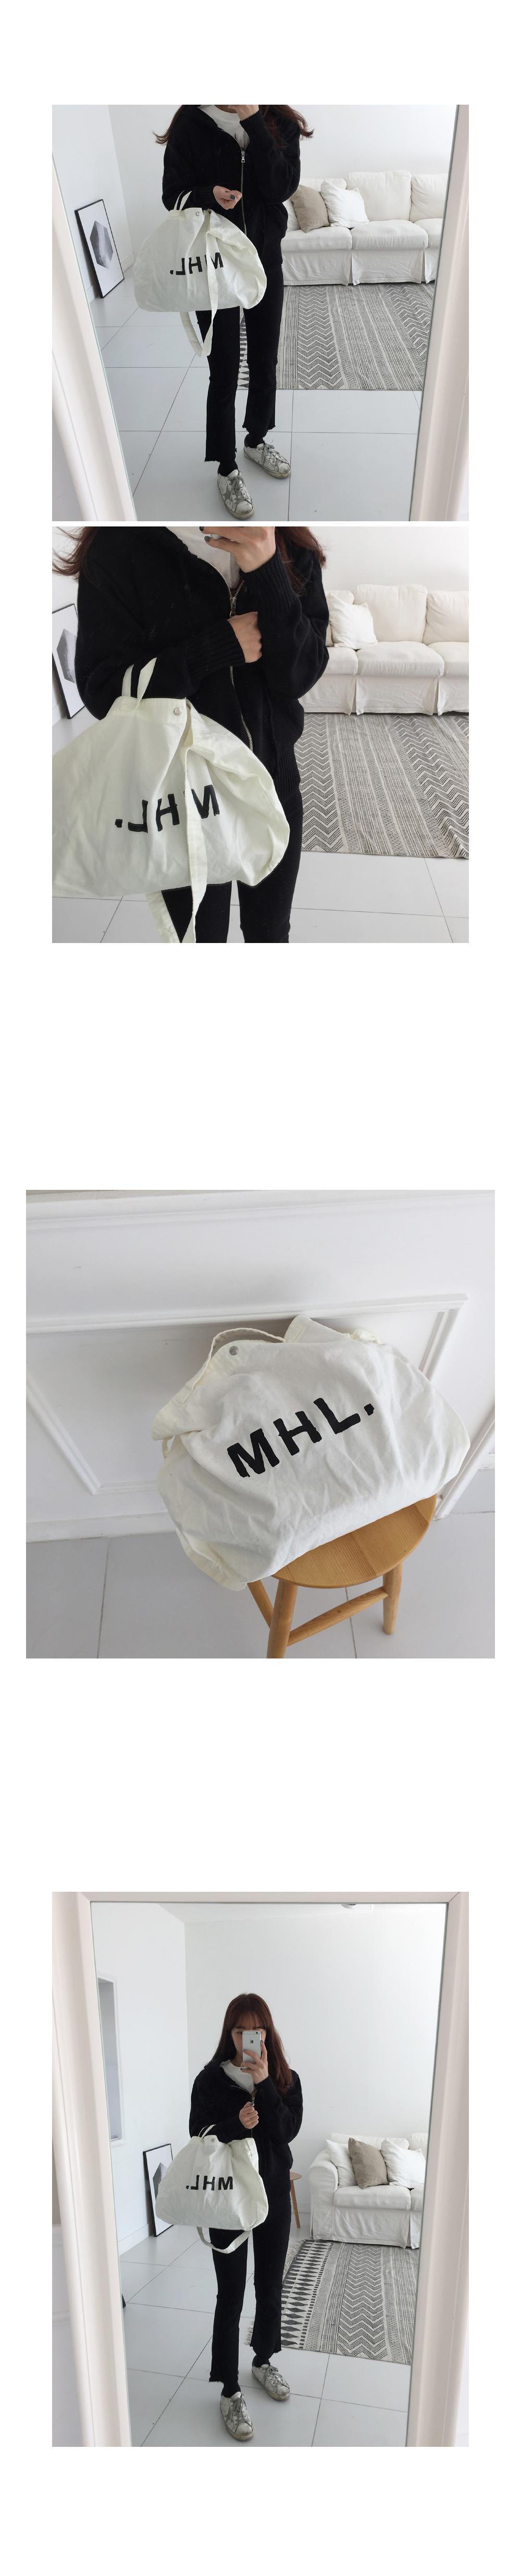 Howell Eco Bag